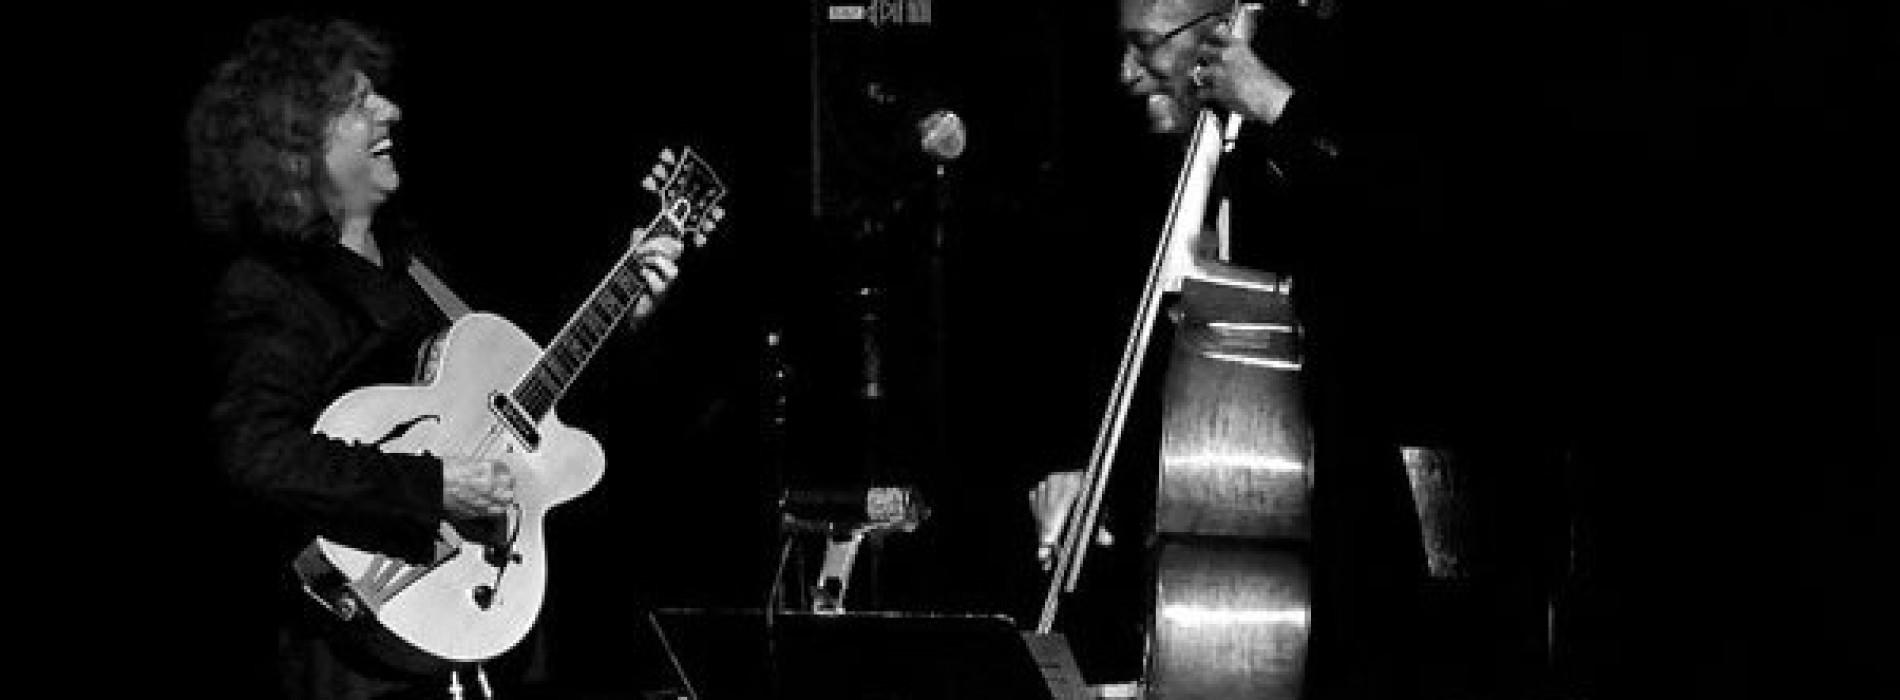 Arena in JAZZ: Pat Metheny e Ron Carter in concerto